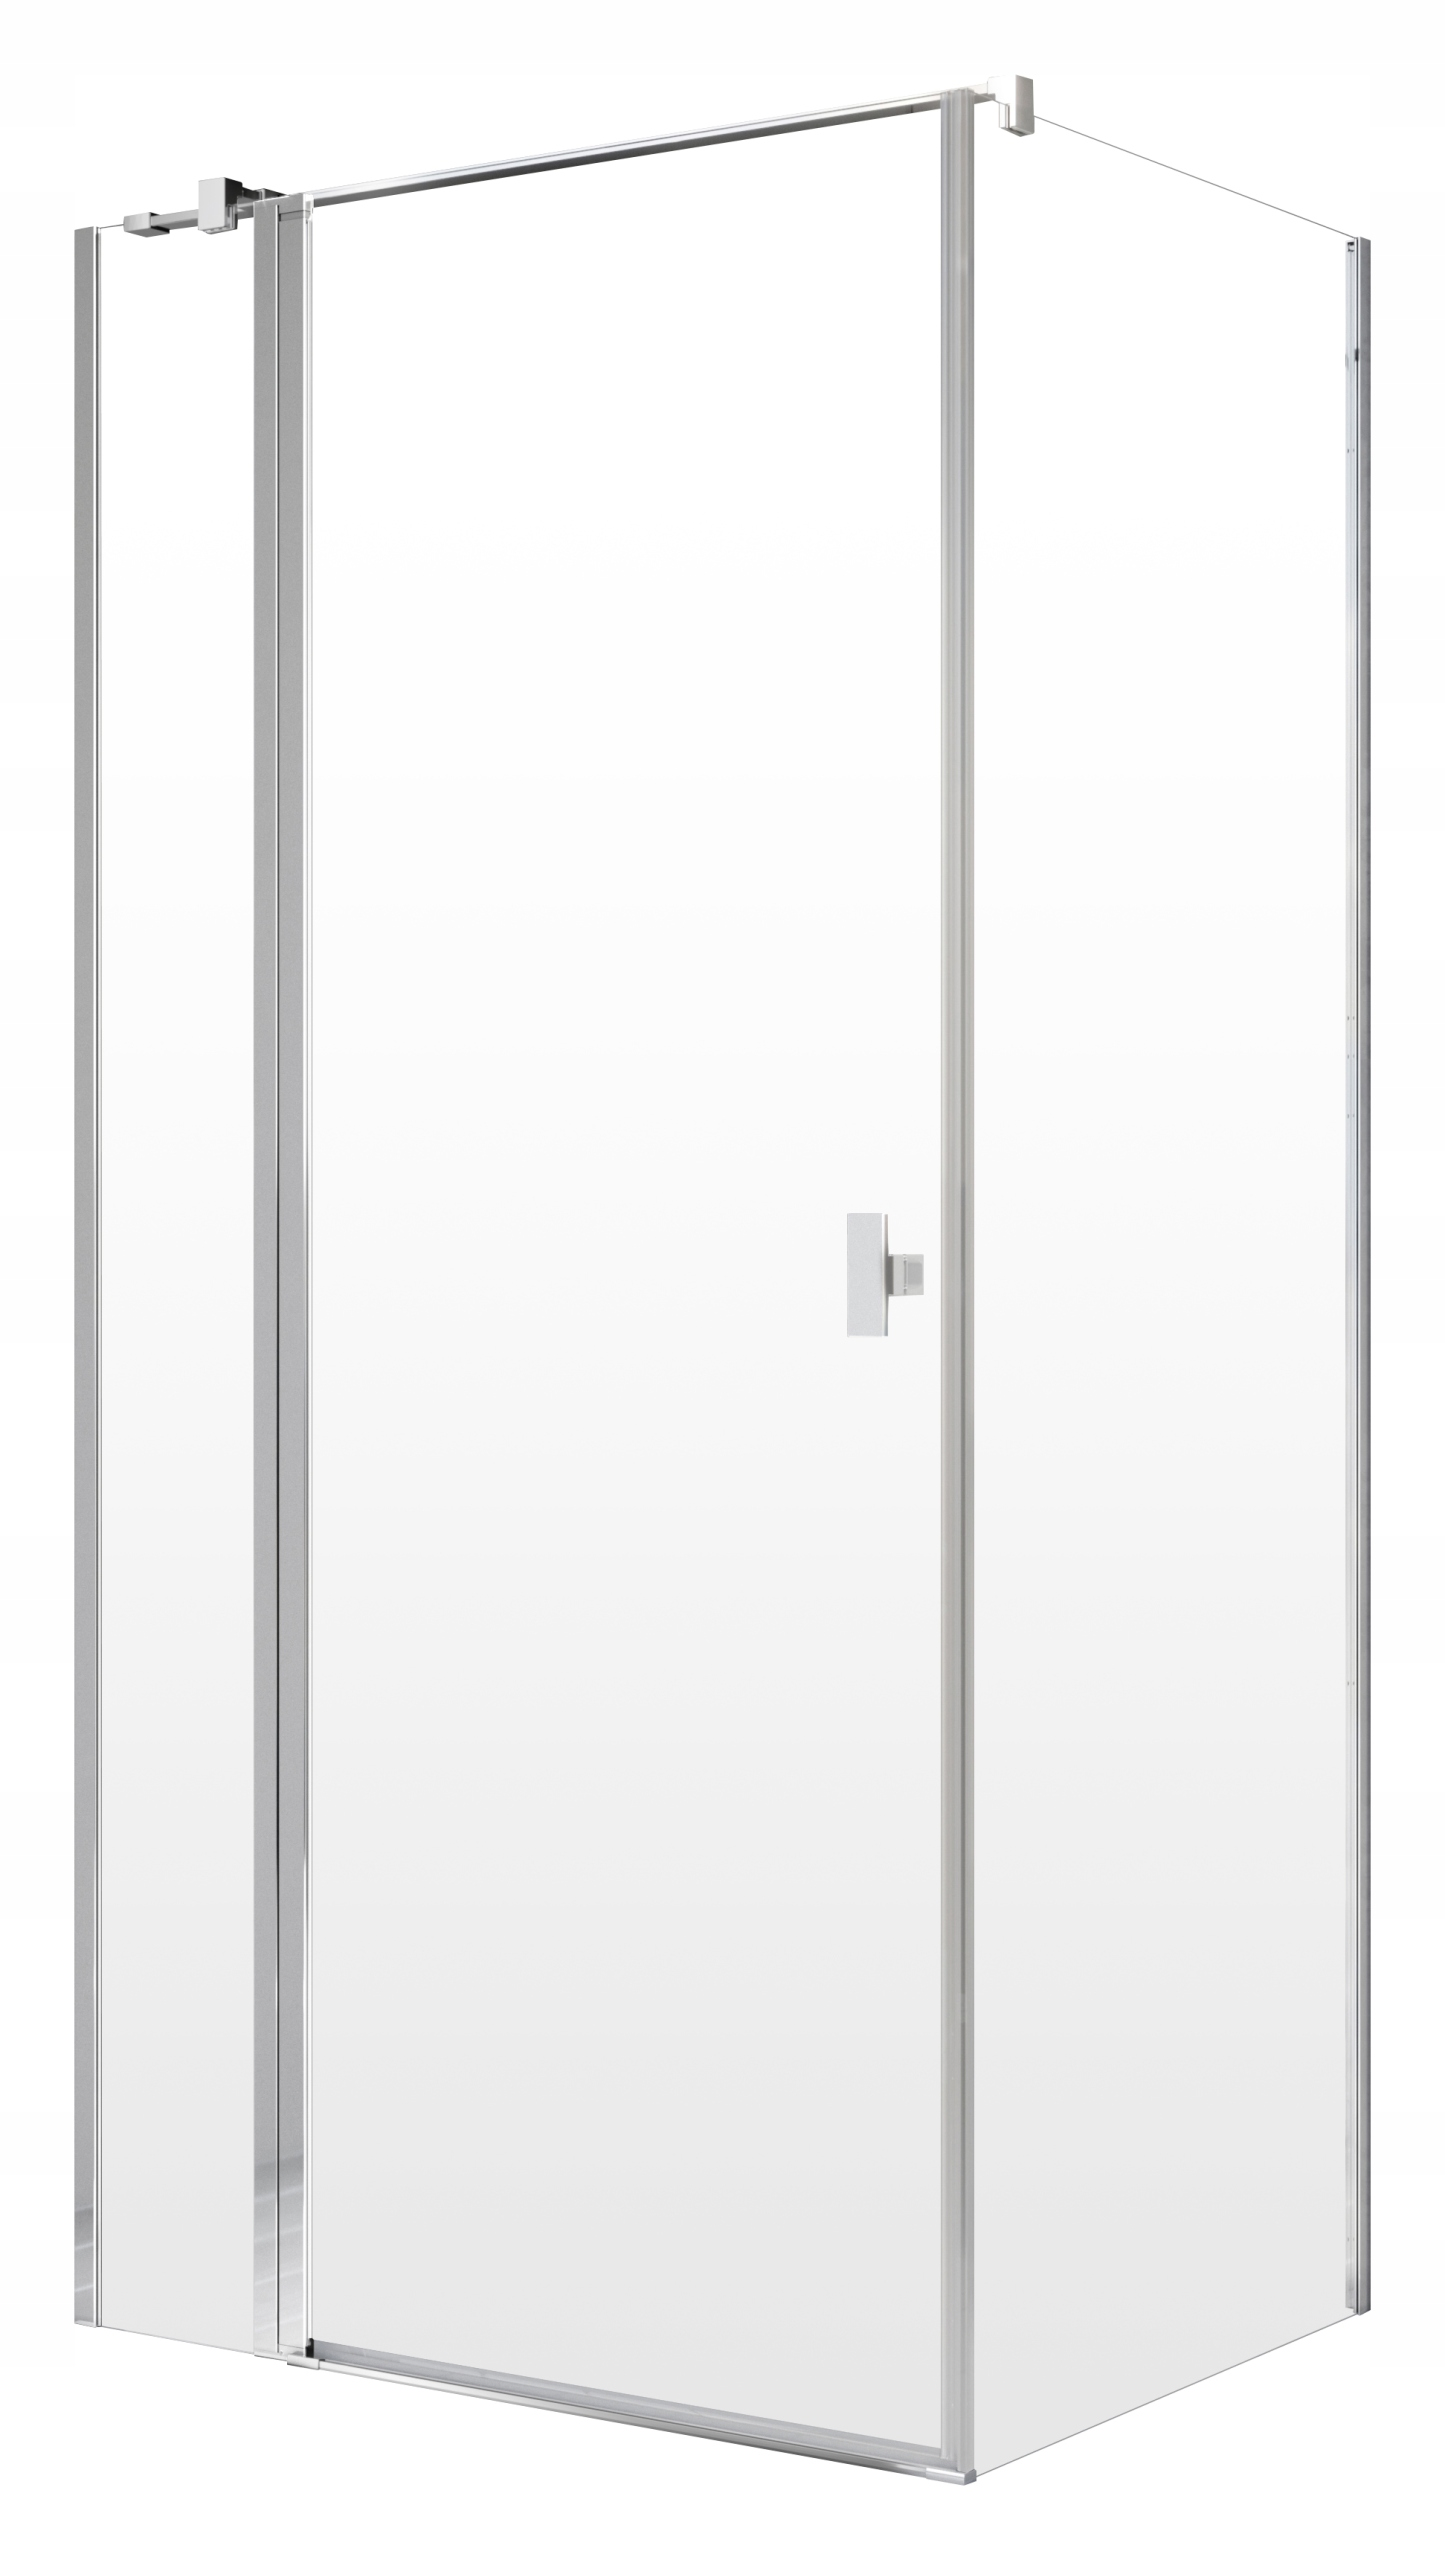 Sprcha Nes II KDJ RADAWAY 90x70x200